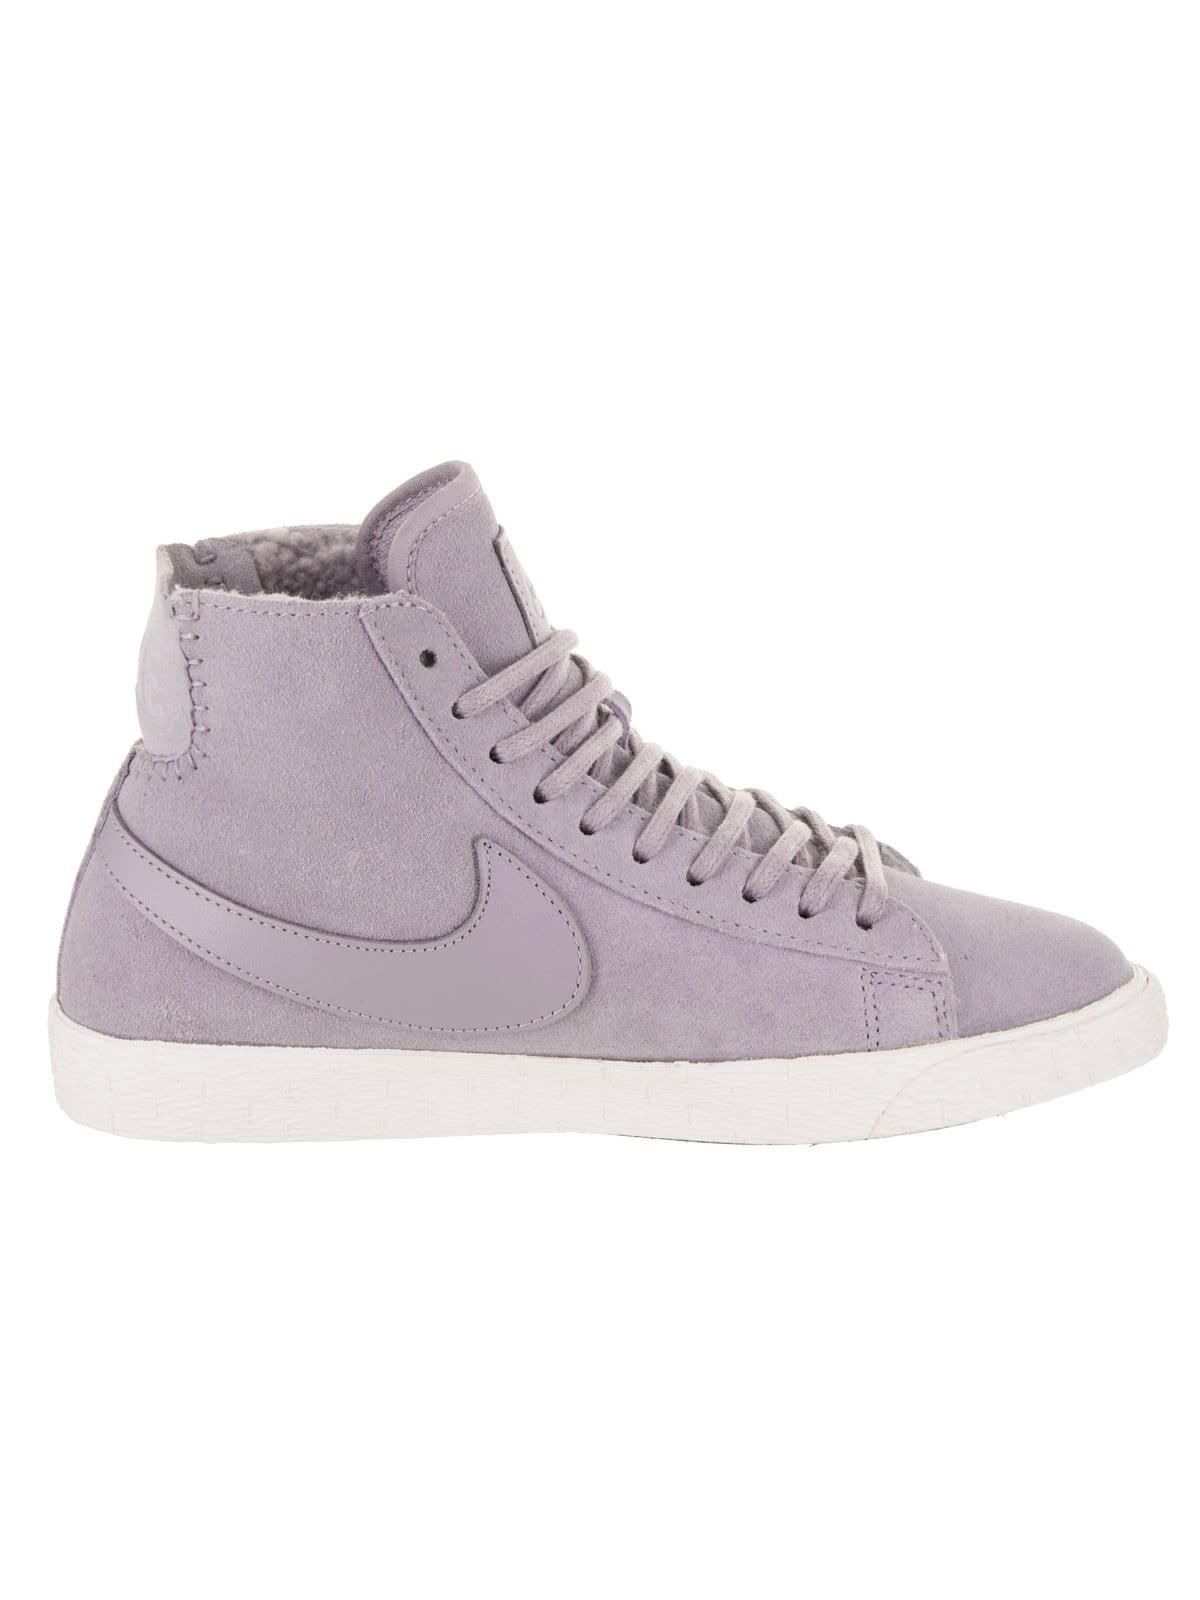 Nike Women's Blazer Mid Prm Casual Shoe